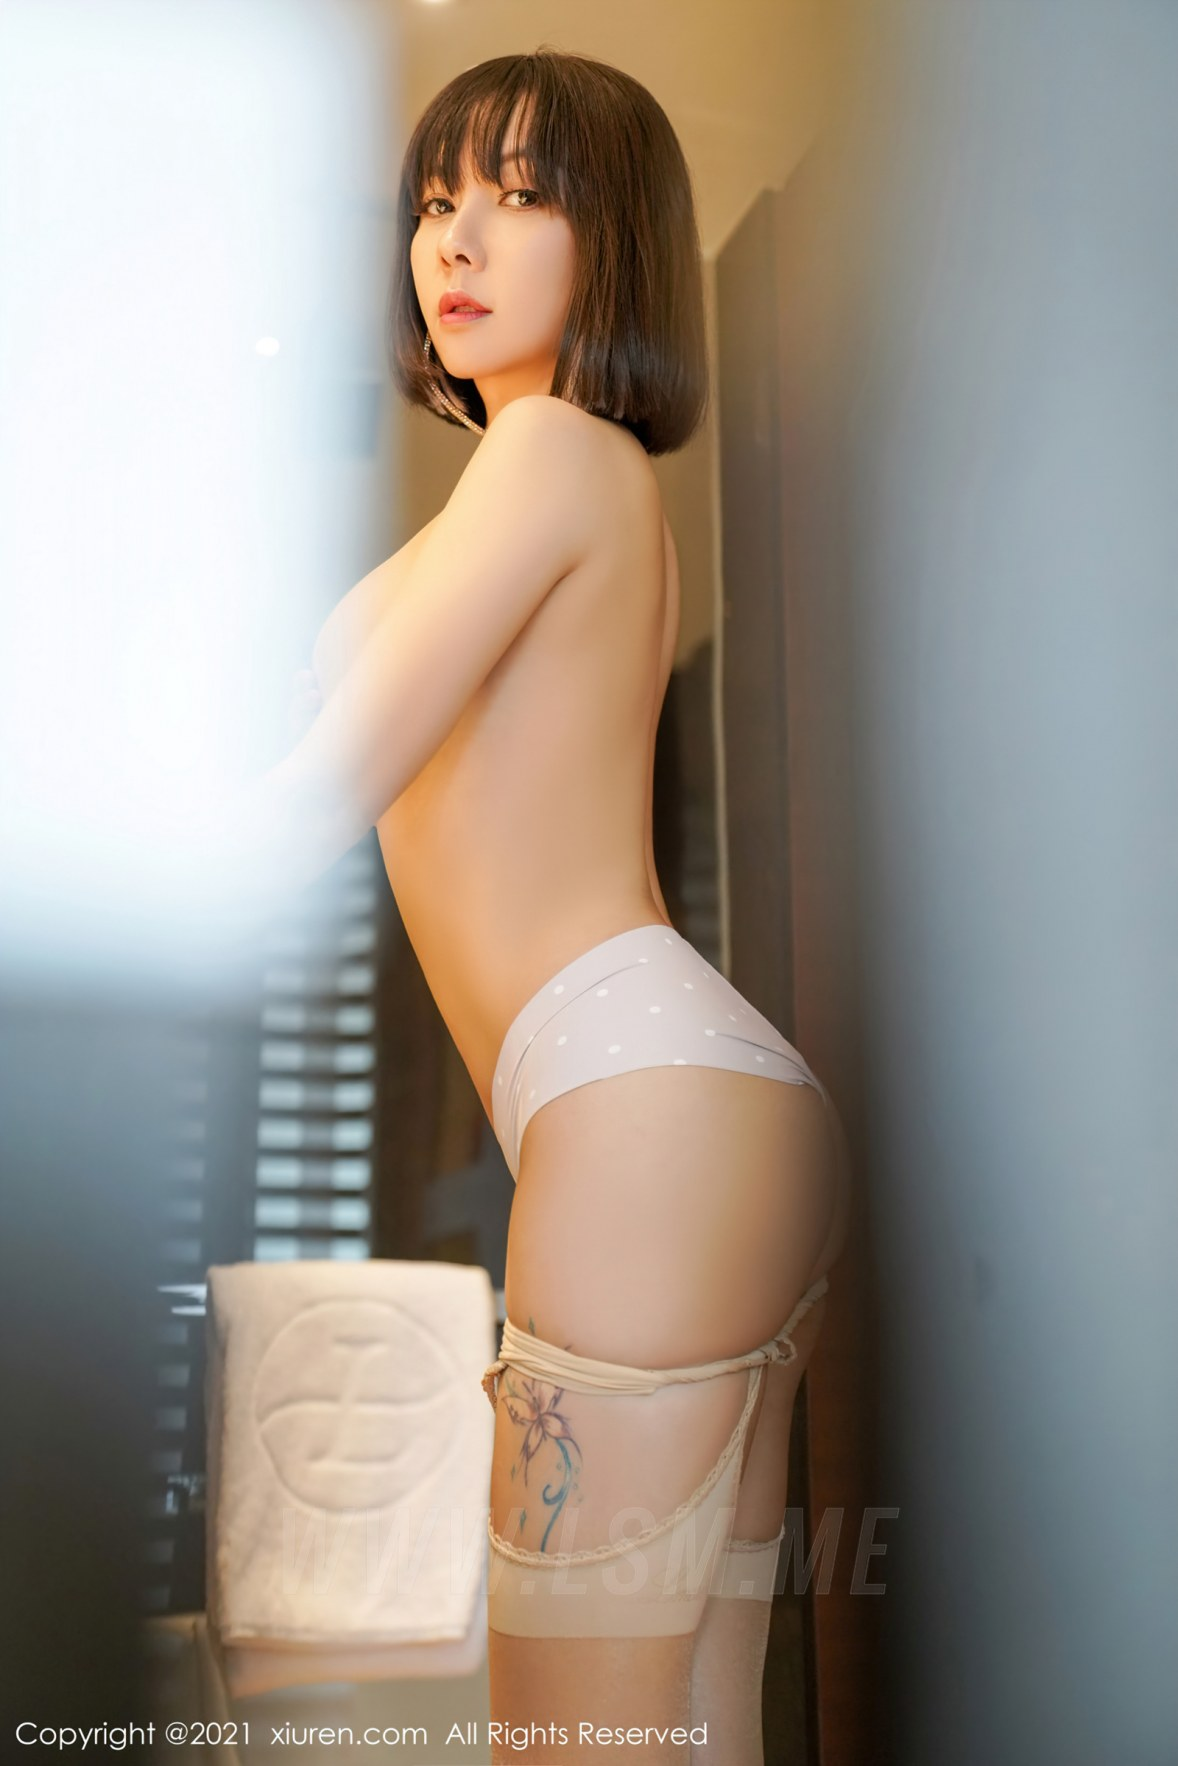 3719 048 0tq 3603 5400 - XiuRen 秀人 No.3719 白色礼裙 果儿Victoria 御姐北京旅拍3 - 秀人网 -【免费在线写真】【丽人丝语】